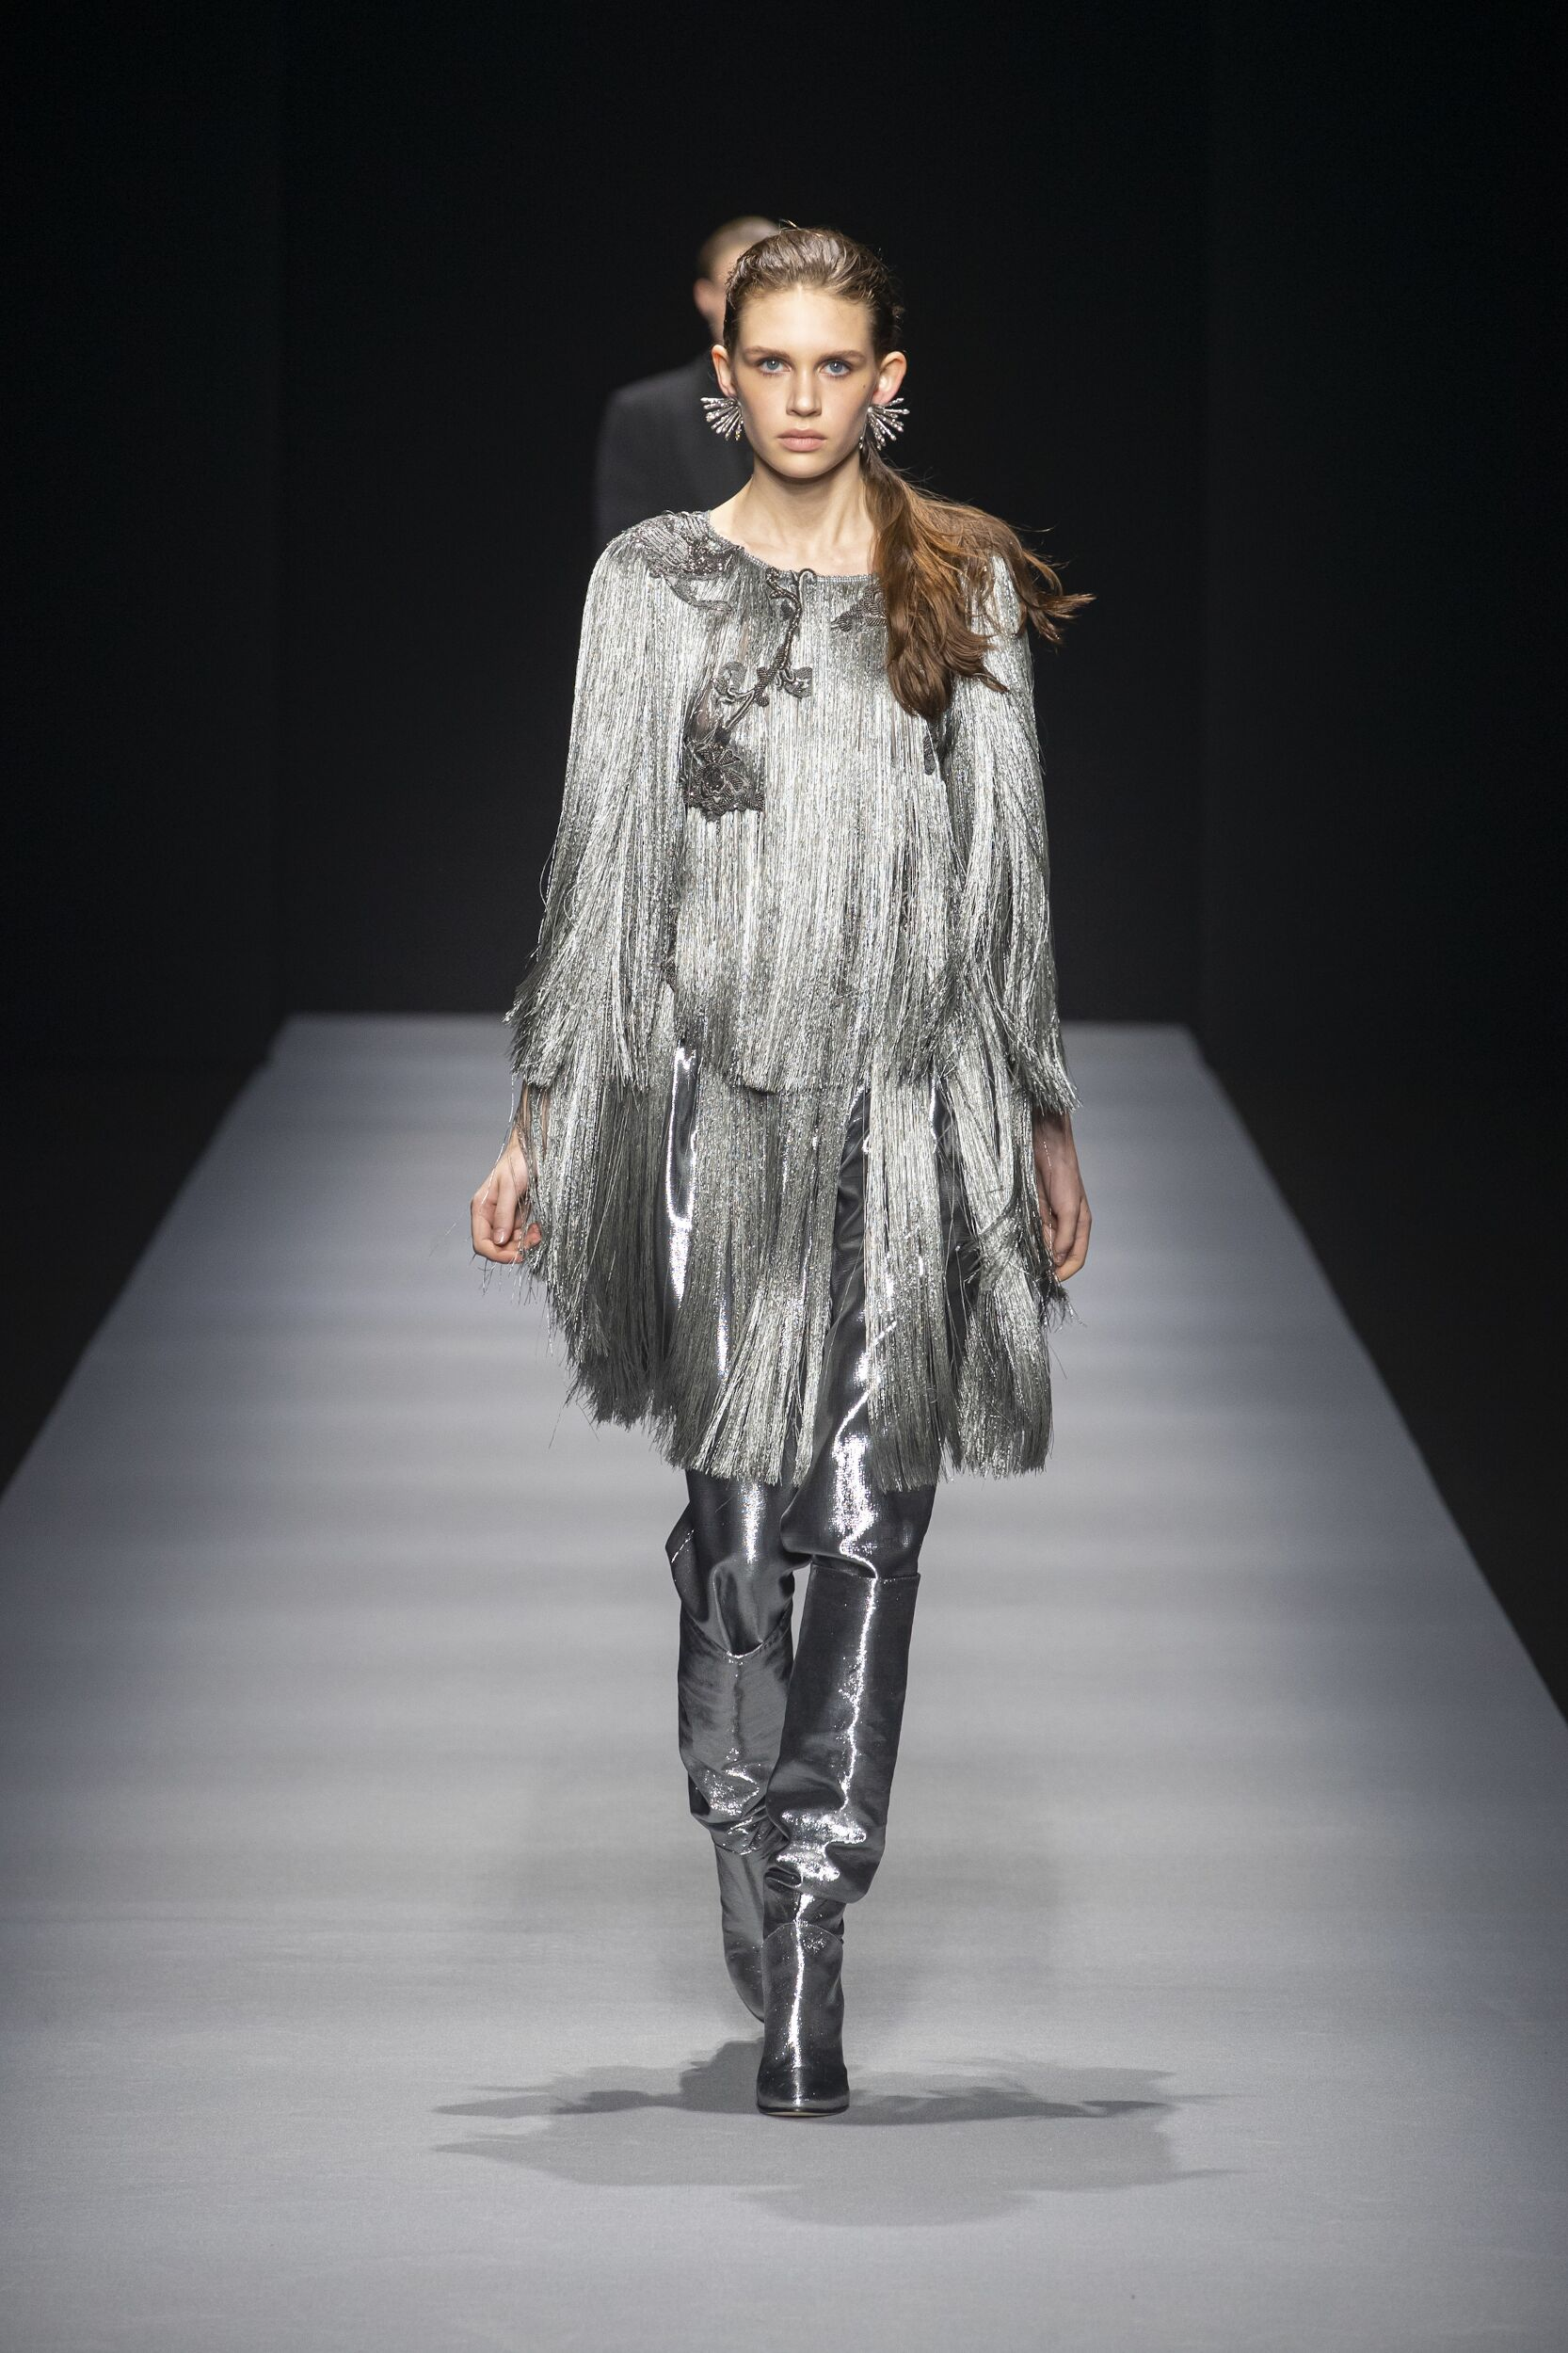 Womenswear Winter Alberta Ferretti 2020